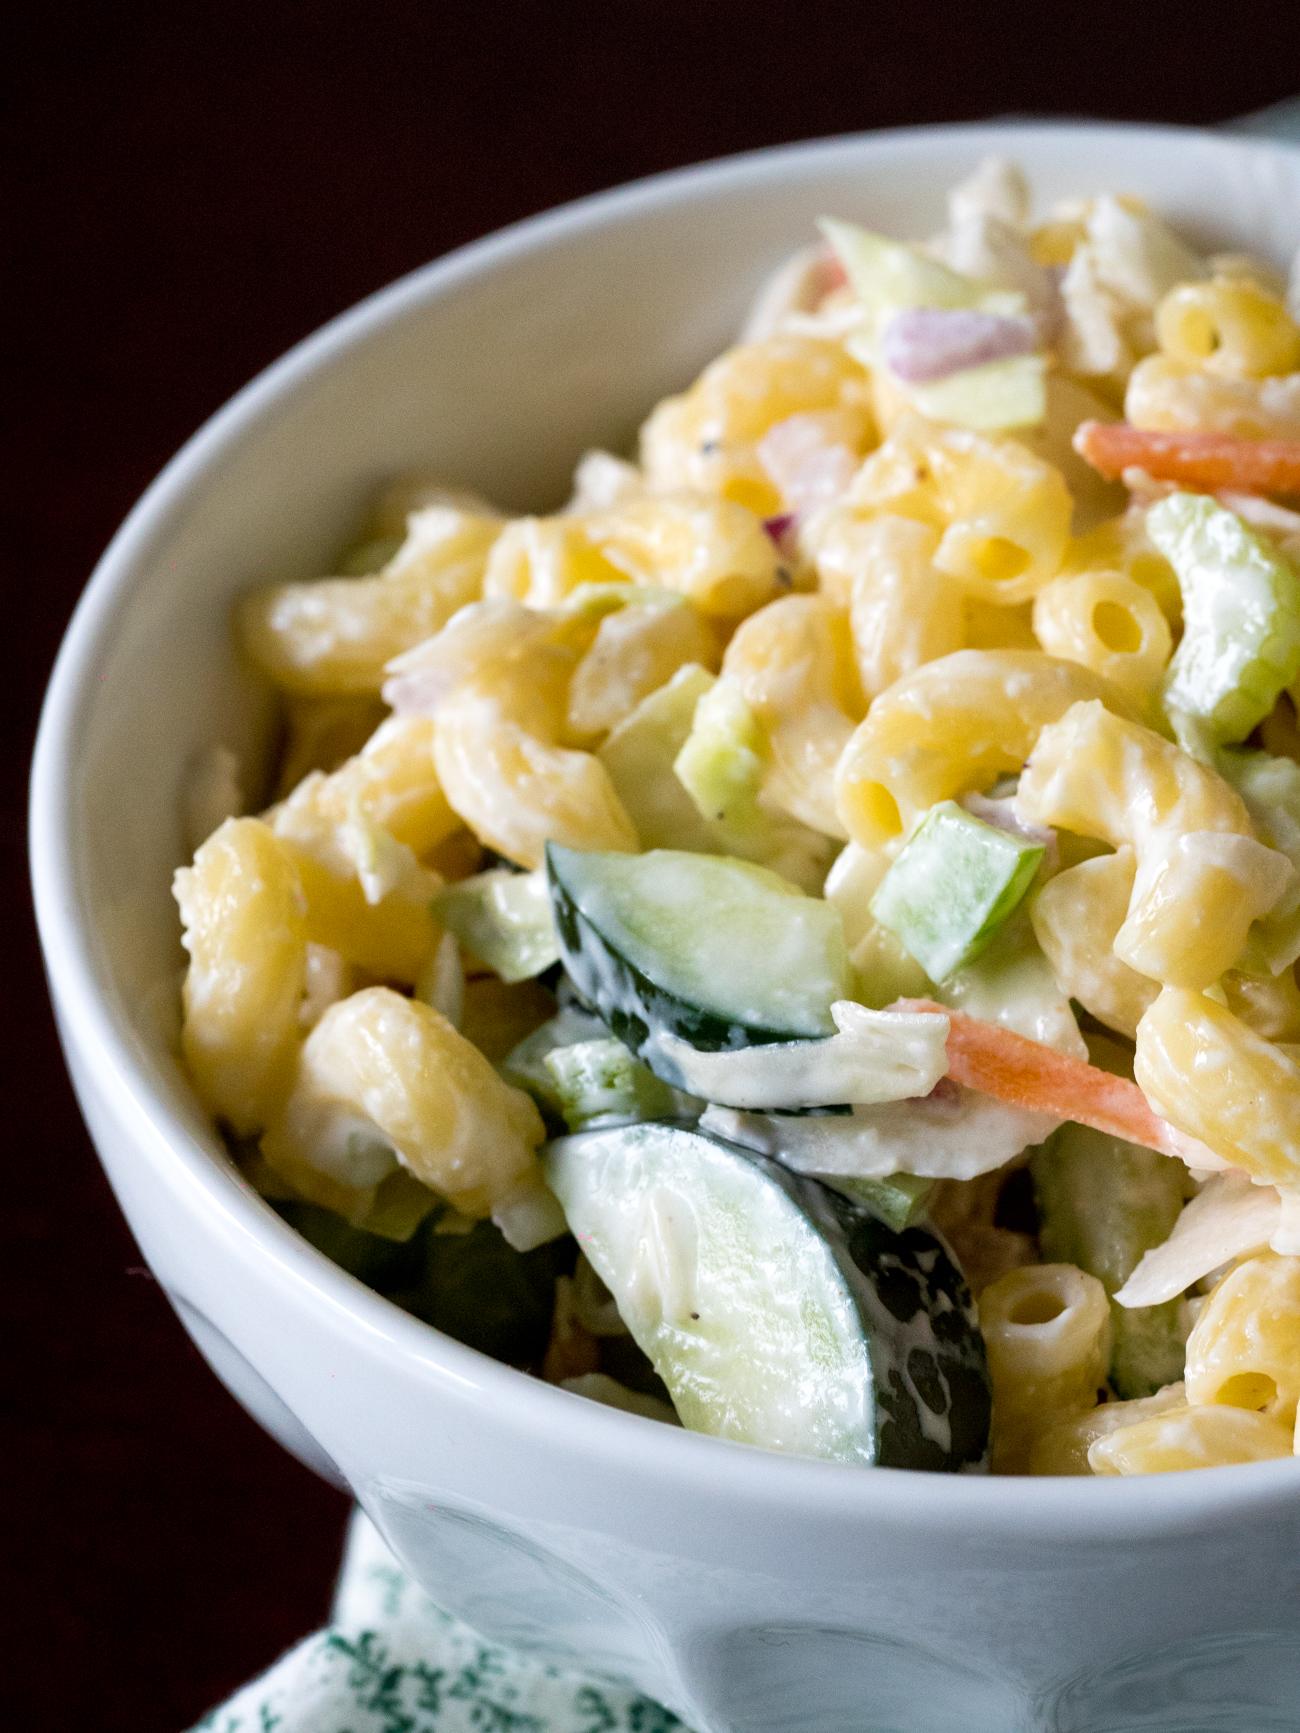 Macaroni Coleslaw Salad Vertical 1